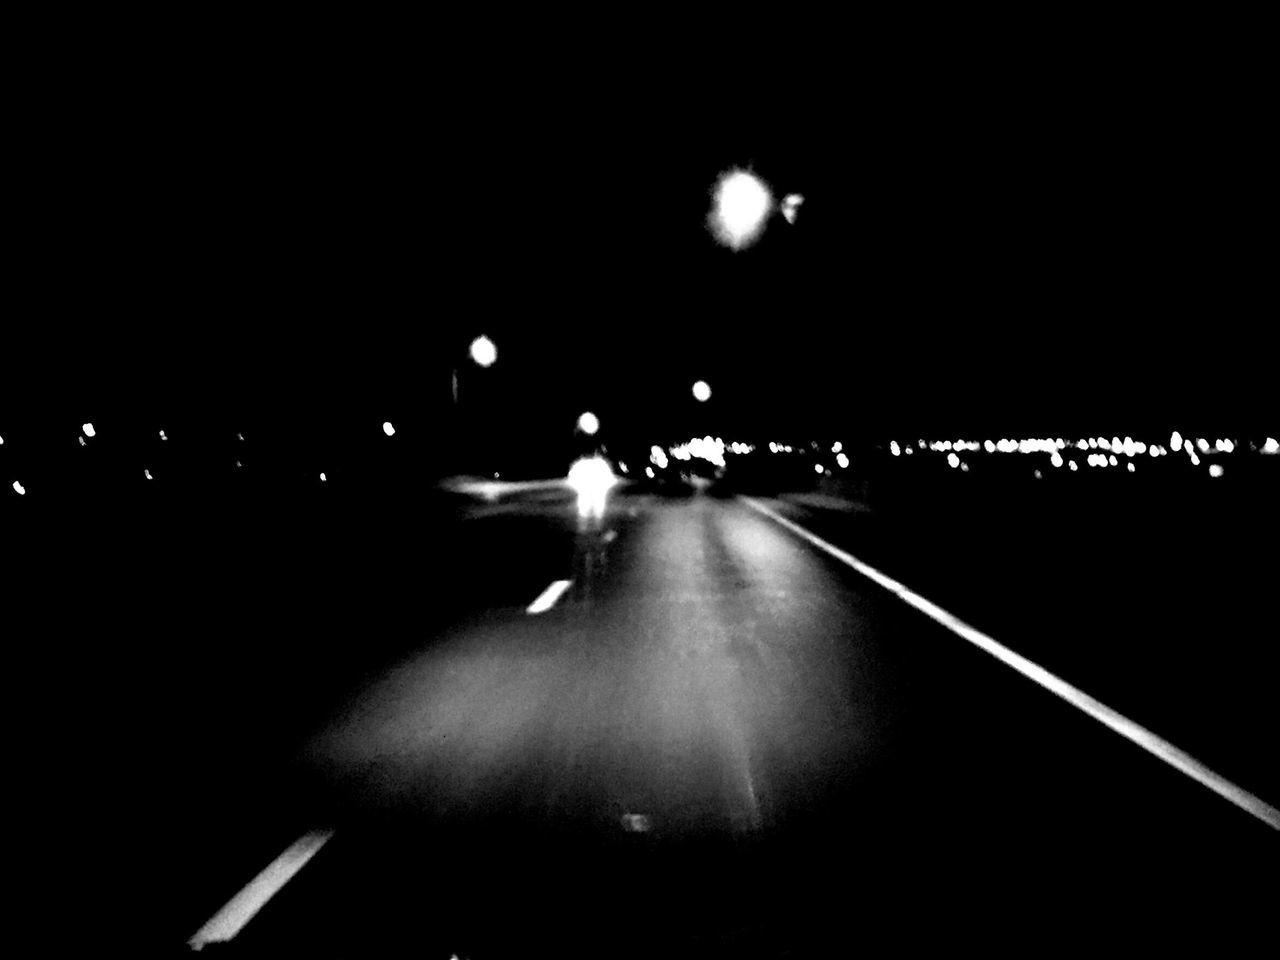 night, illuminated, transportation, road, land vehicle, street light, city, outdoors, no people